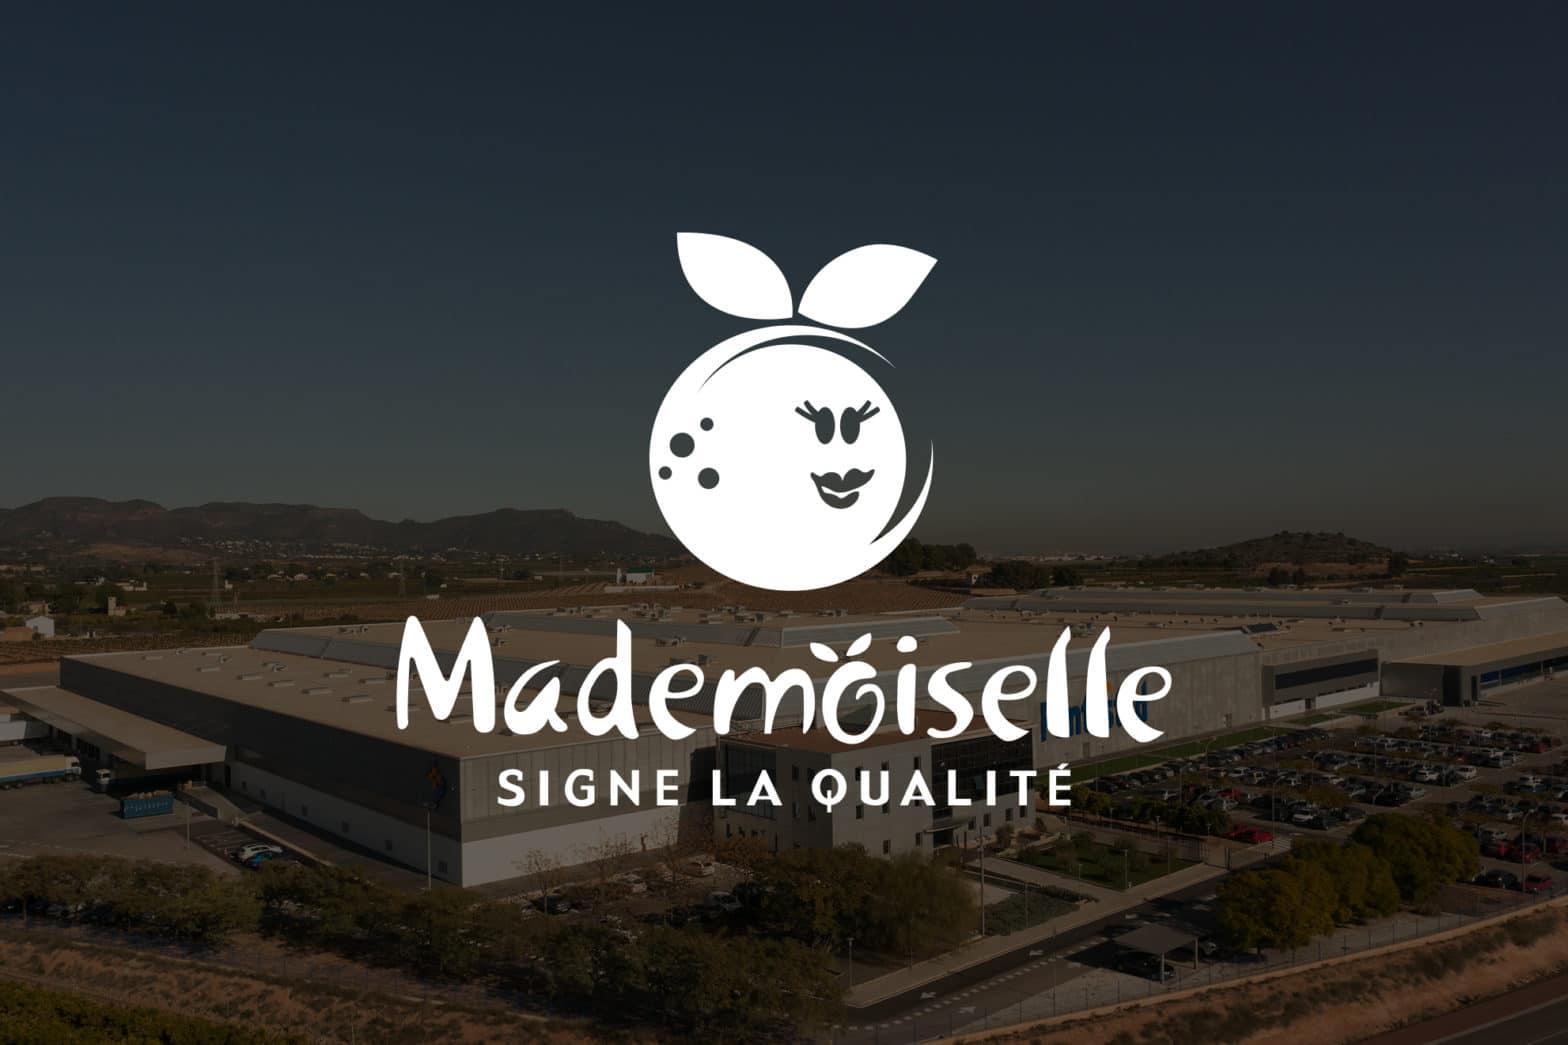 mademoiselle fruits